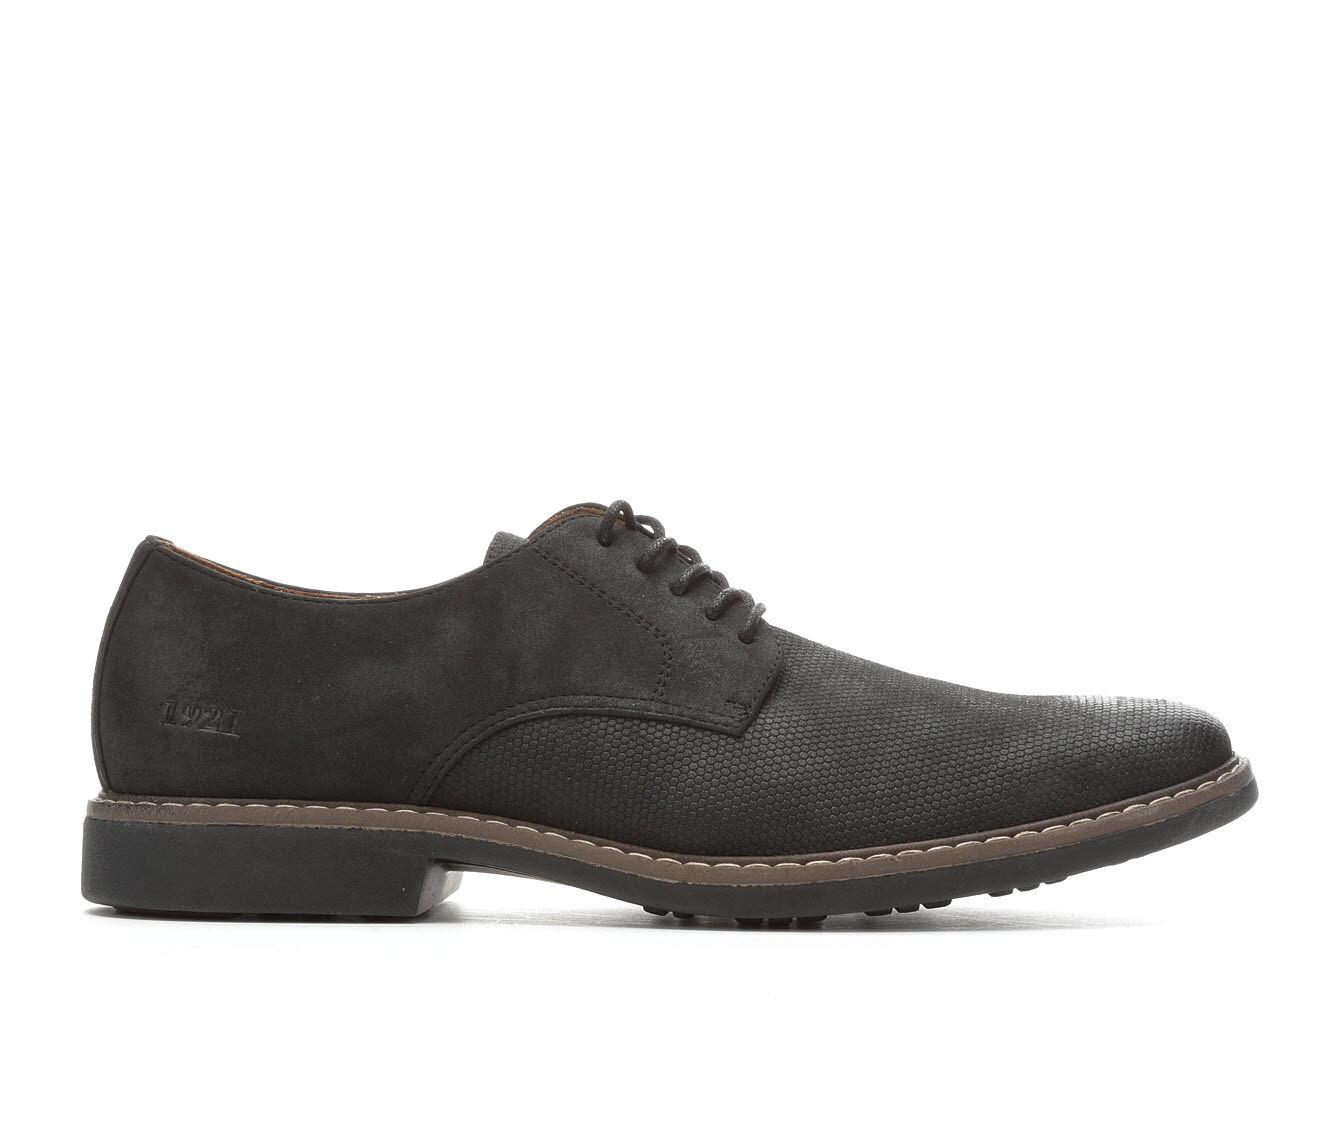 uk shoes_kd1735